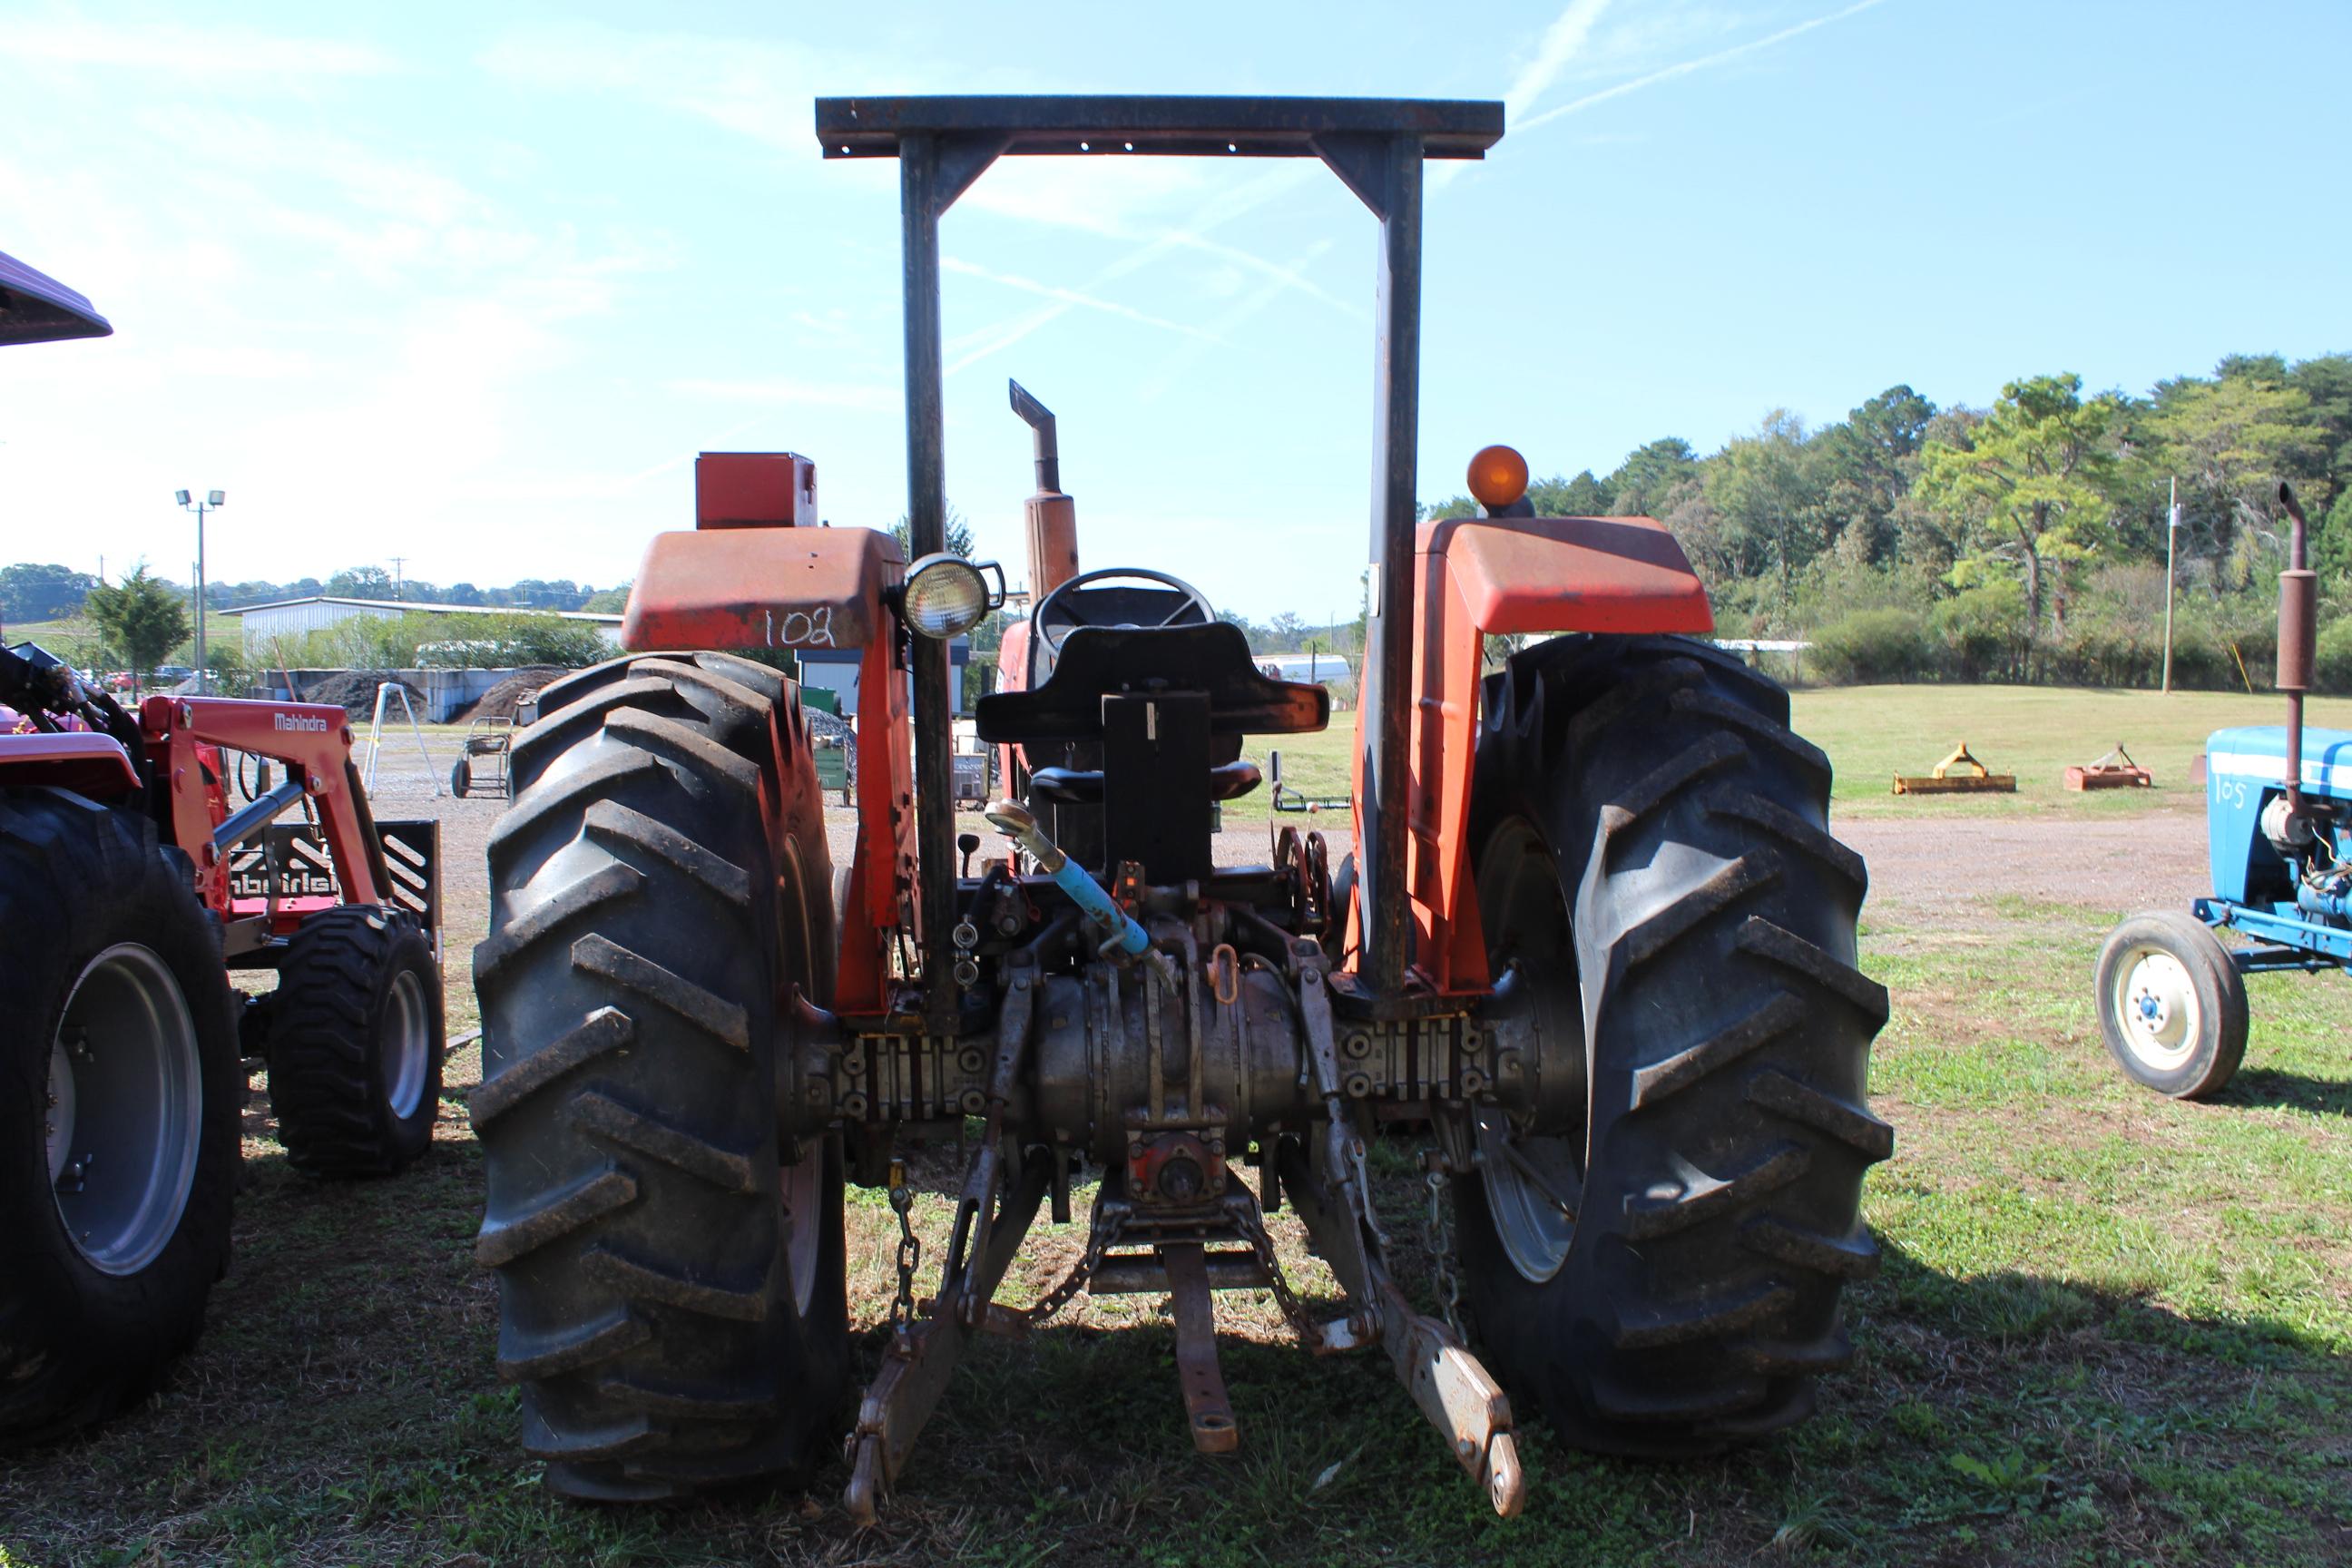 Lot 102 - 285 MASSEY FERGUESON FARM TRACTOR SN#006005